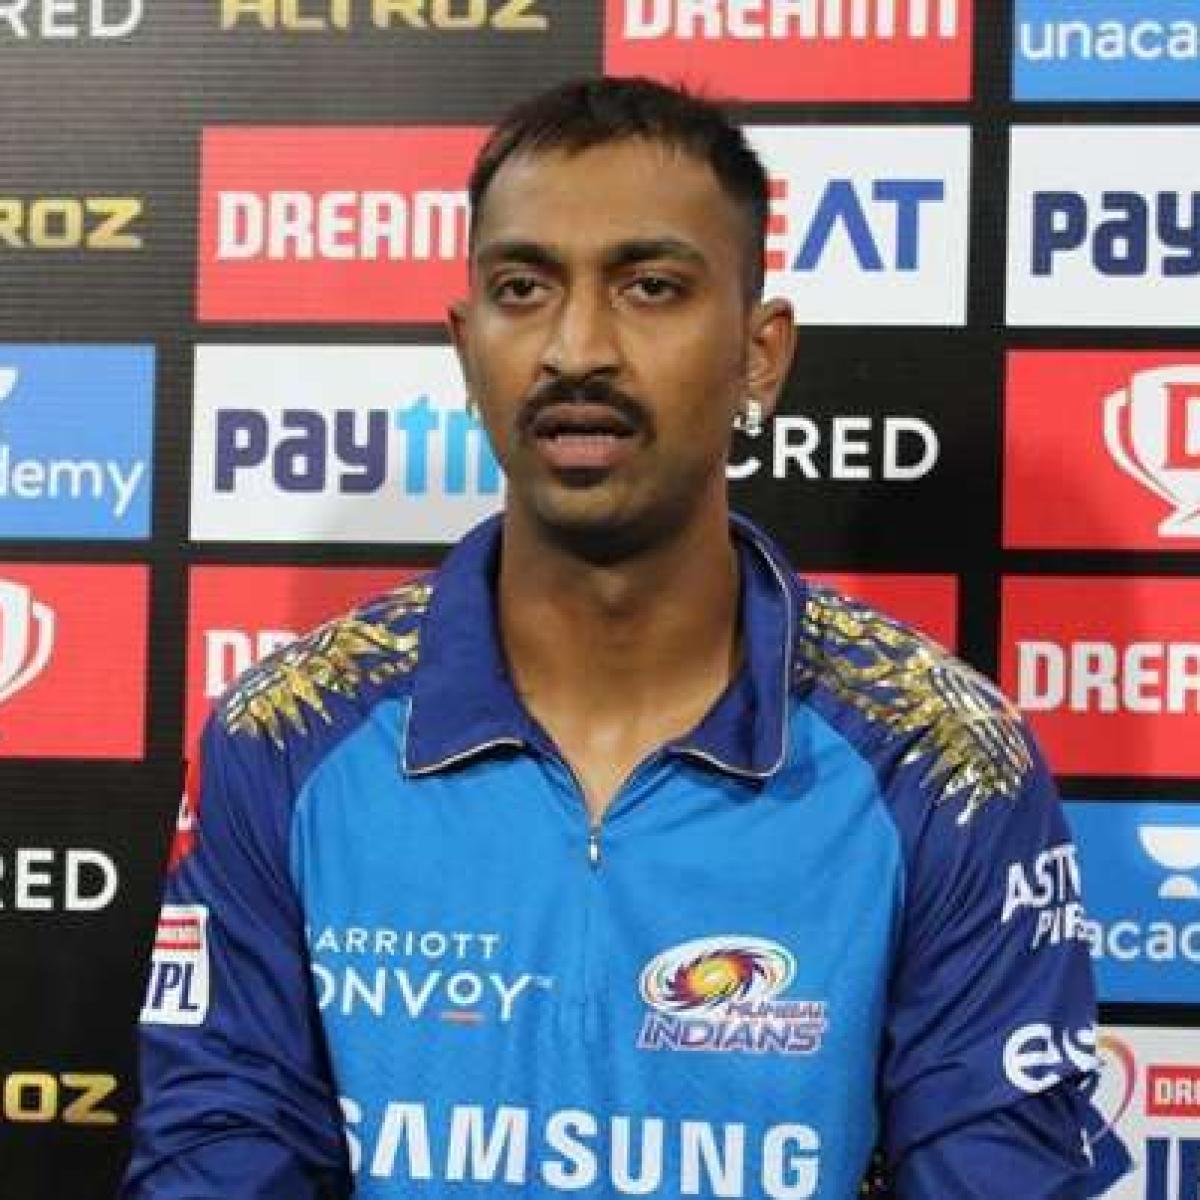 Netizens troll IPL 2020 winner Krunal Pandya for carrying excess valuables